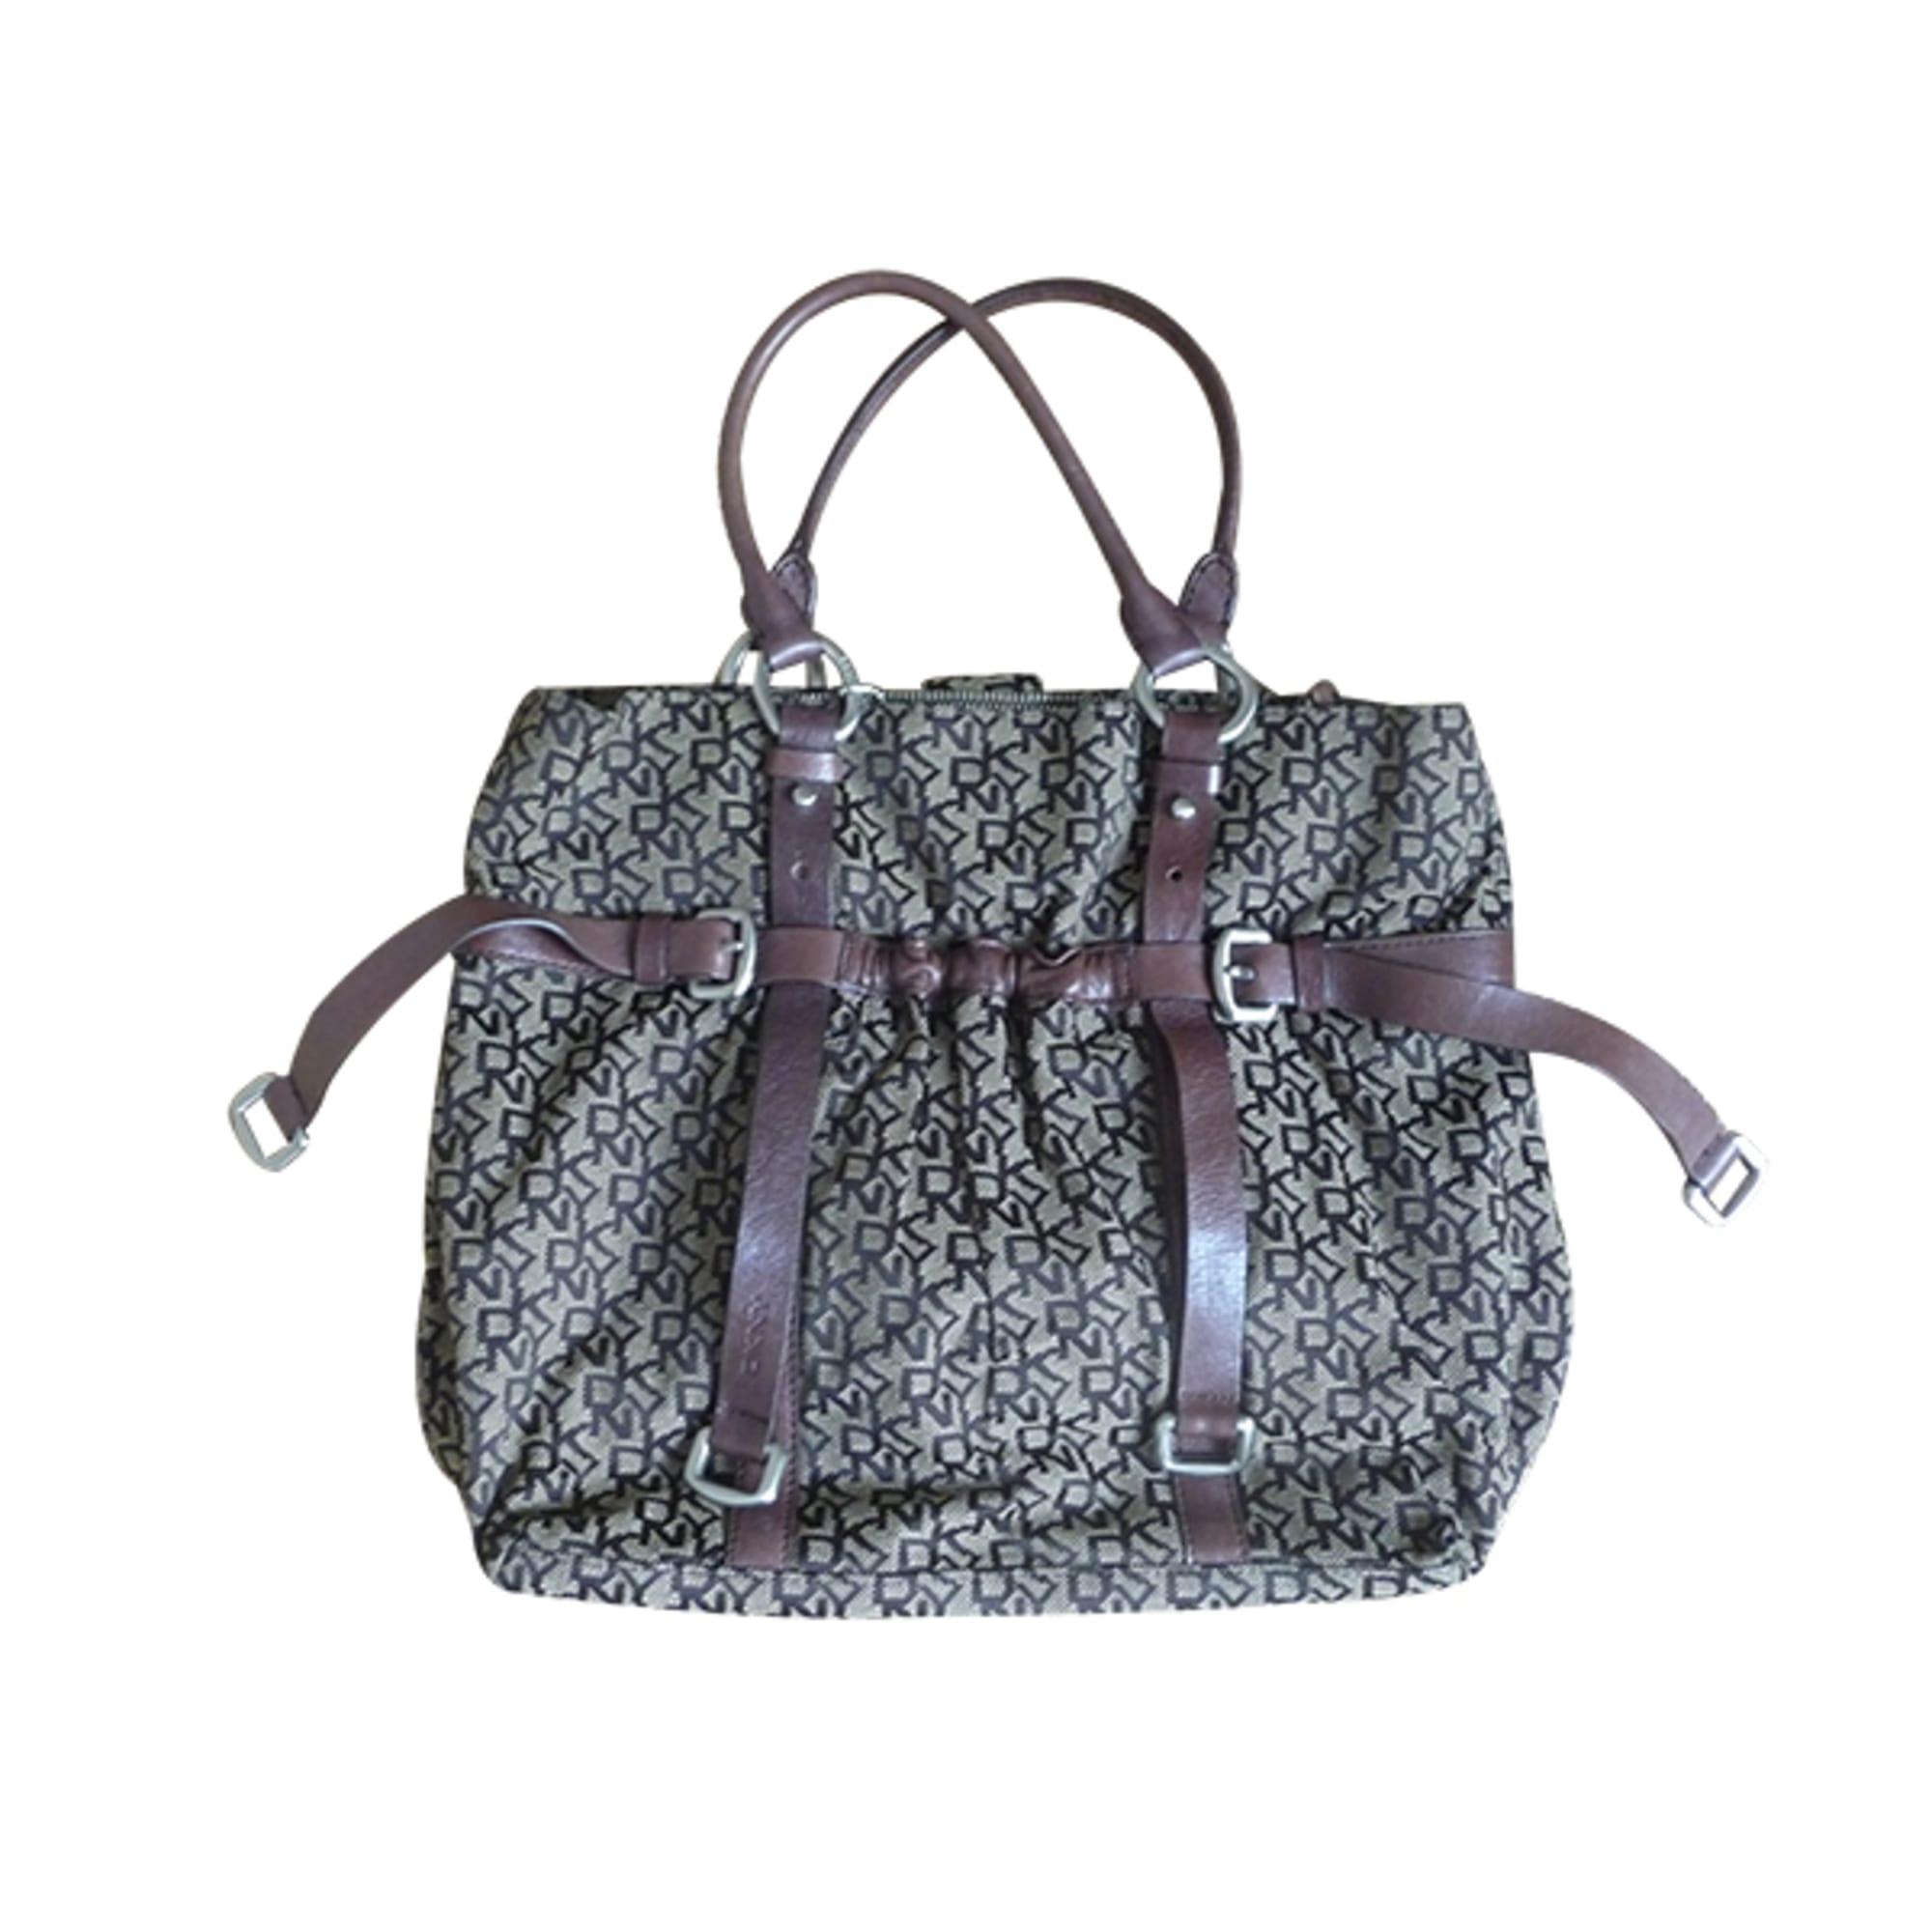 sac main en tissu donna donna karan marron 4183441. Black Bedroom Furniture Sets. Home Design Ideas